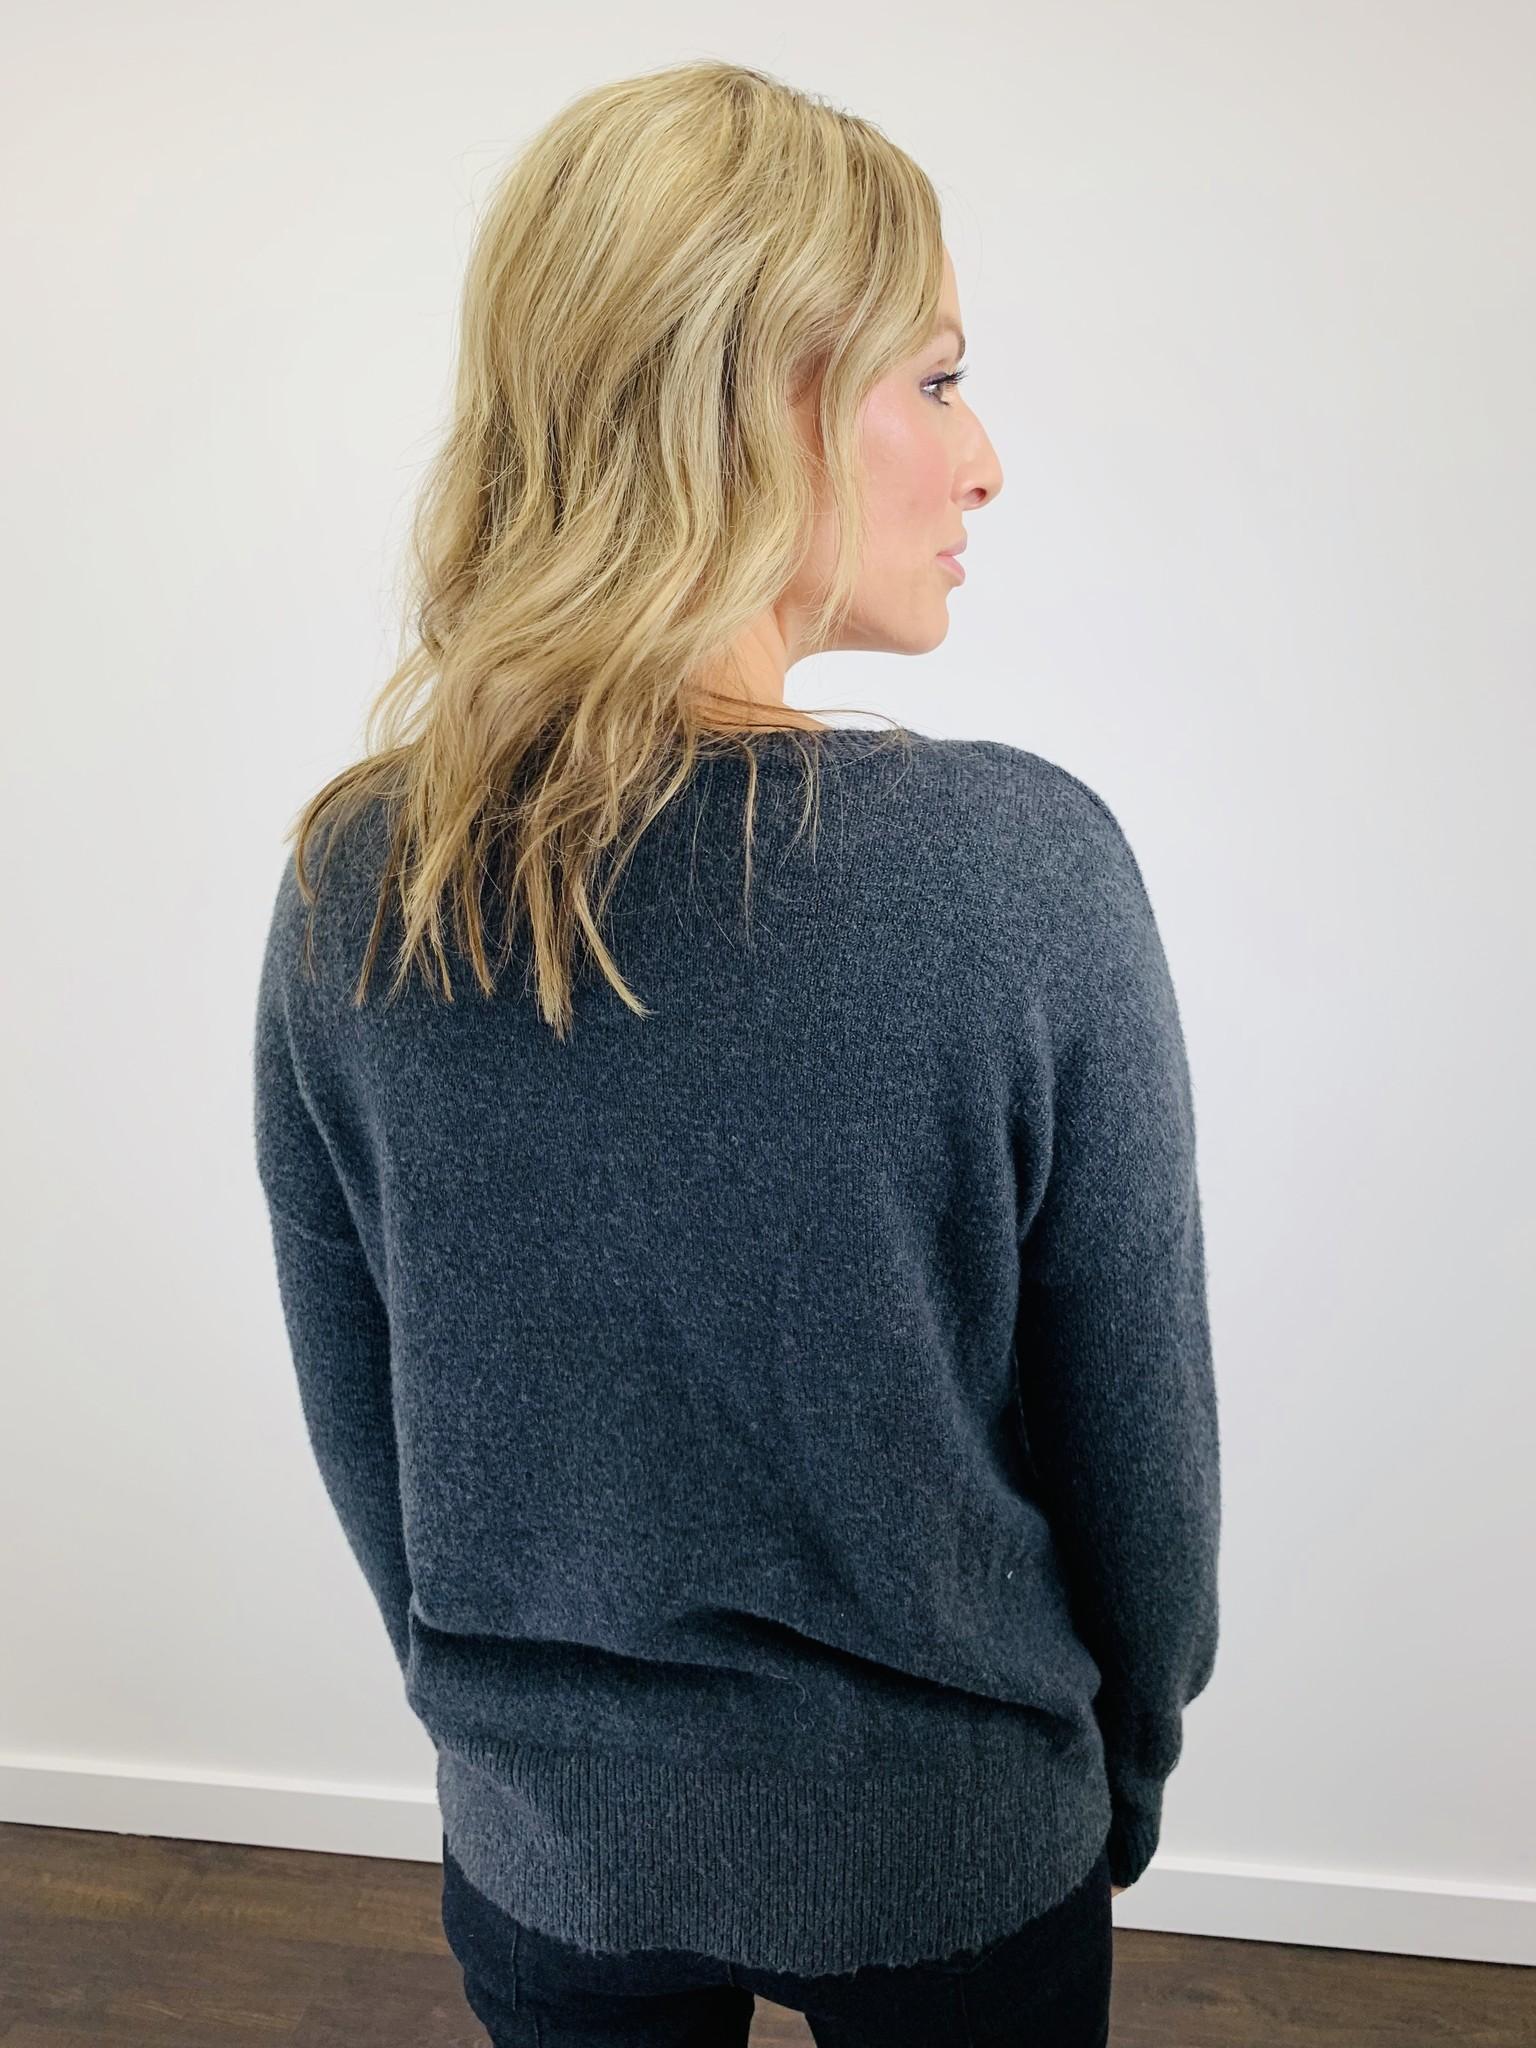 Karissa & Me Cozy Crew Sweater in Charcoal